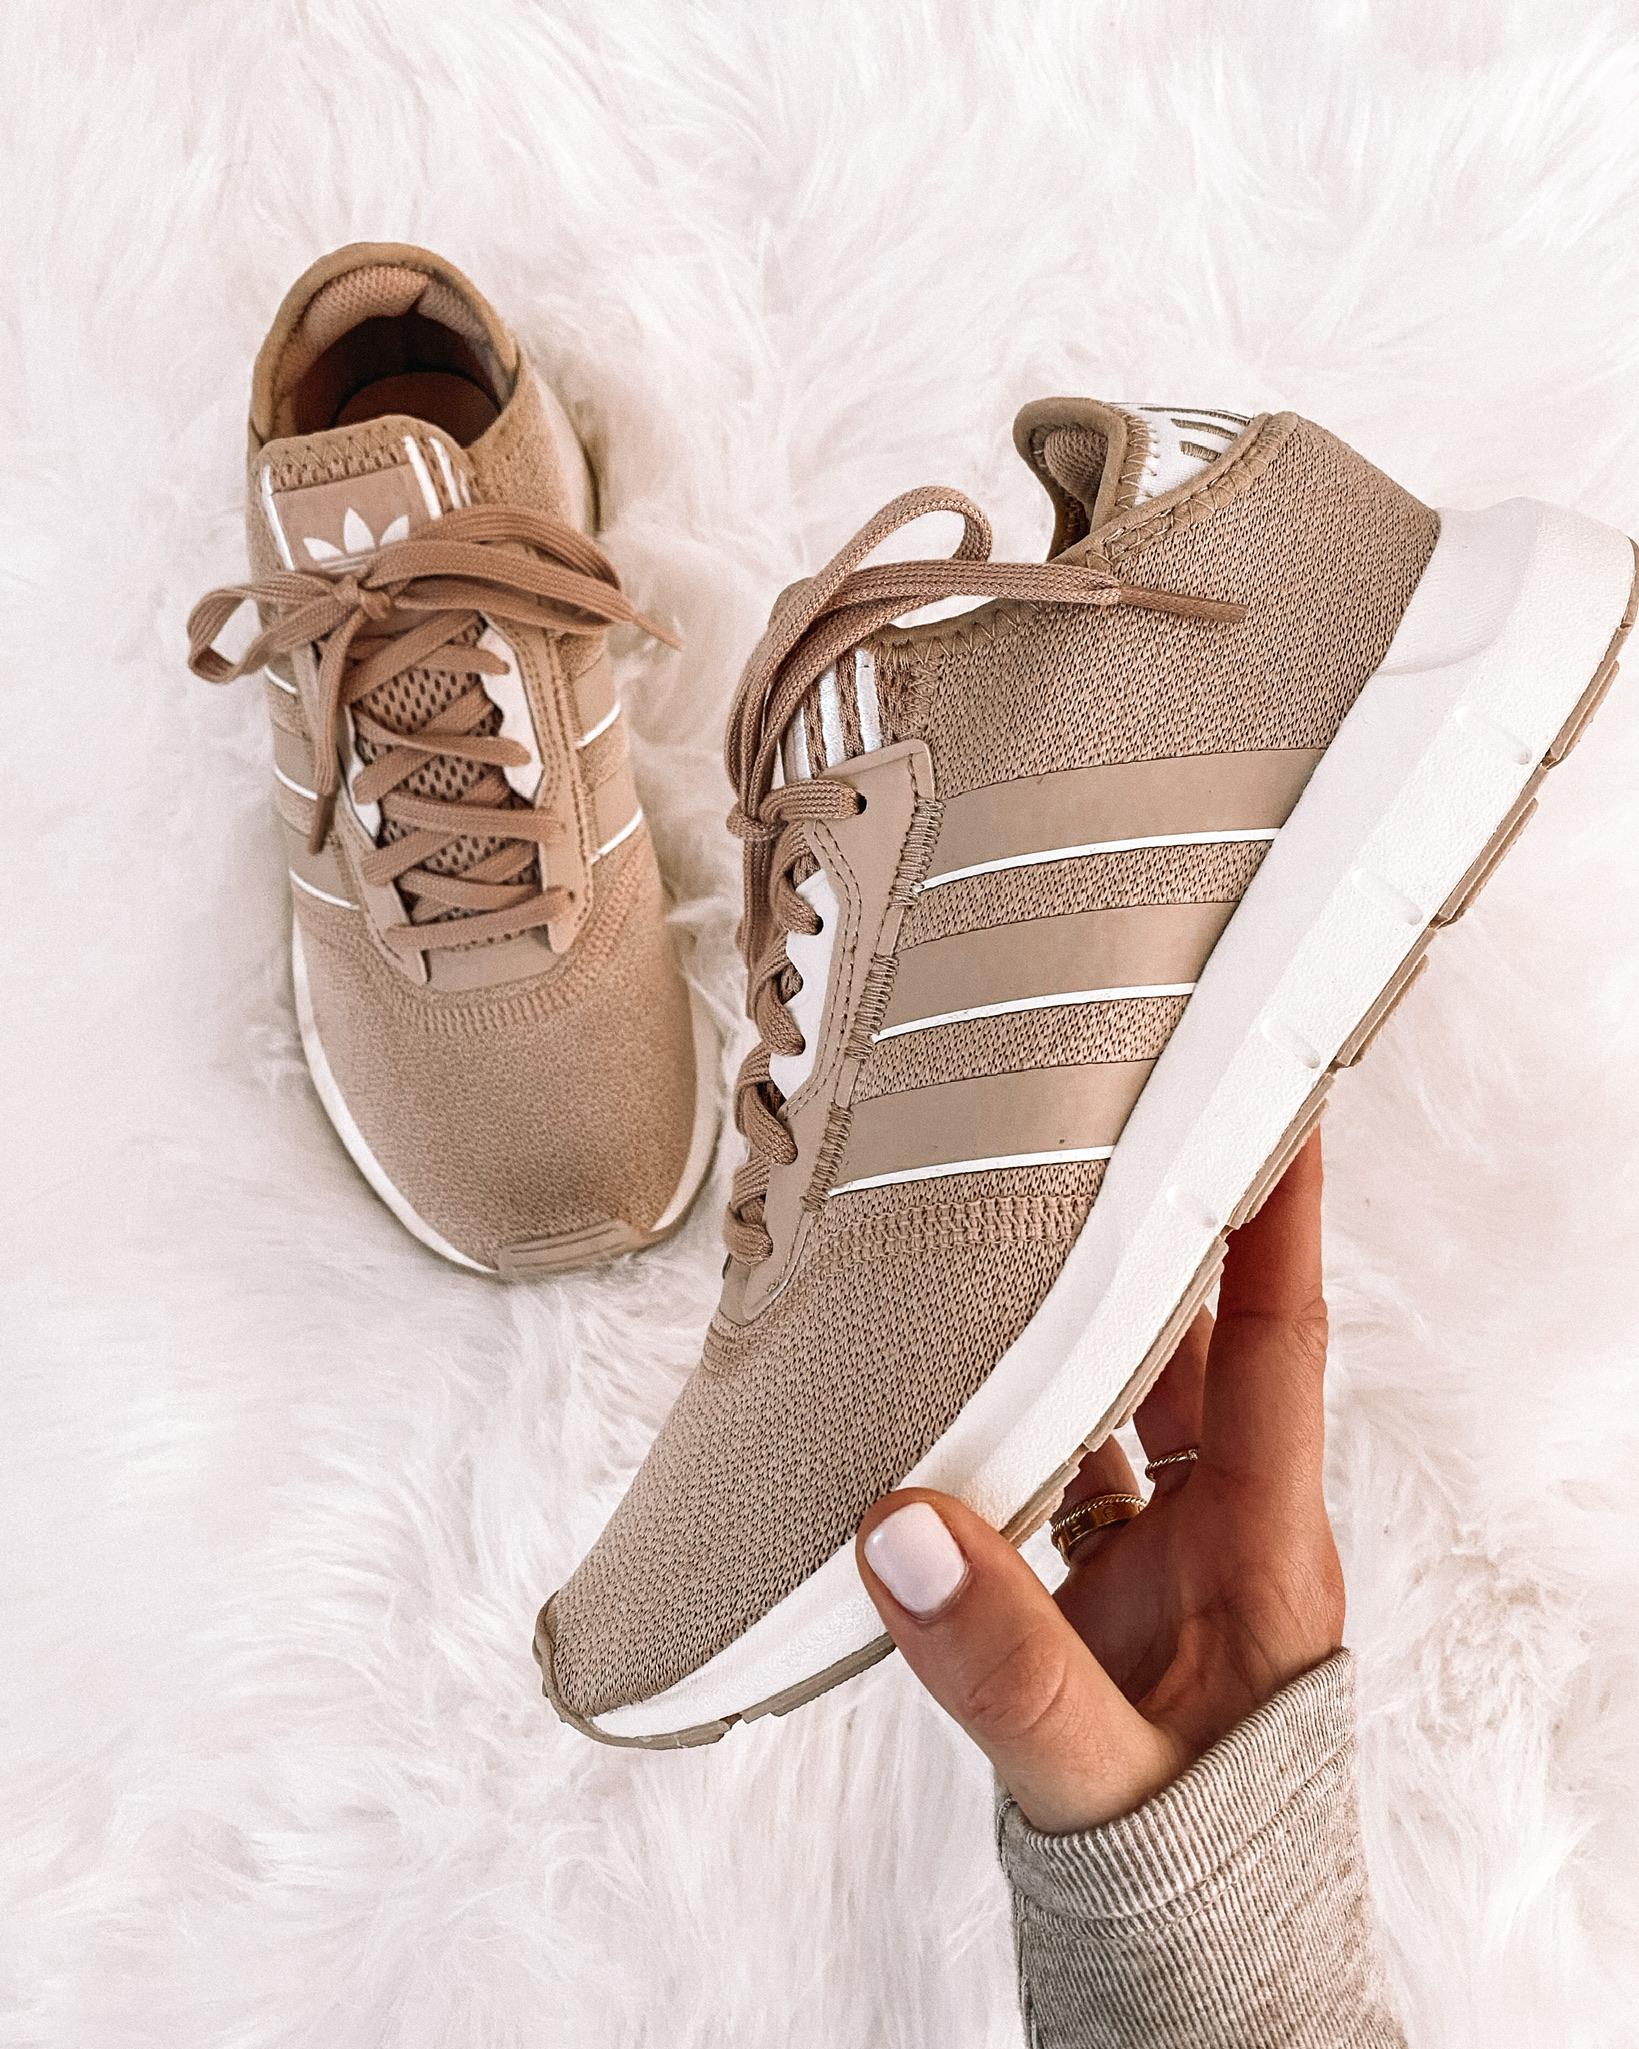 Fashion Jackson adidas beige sneakers